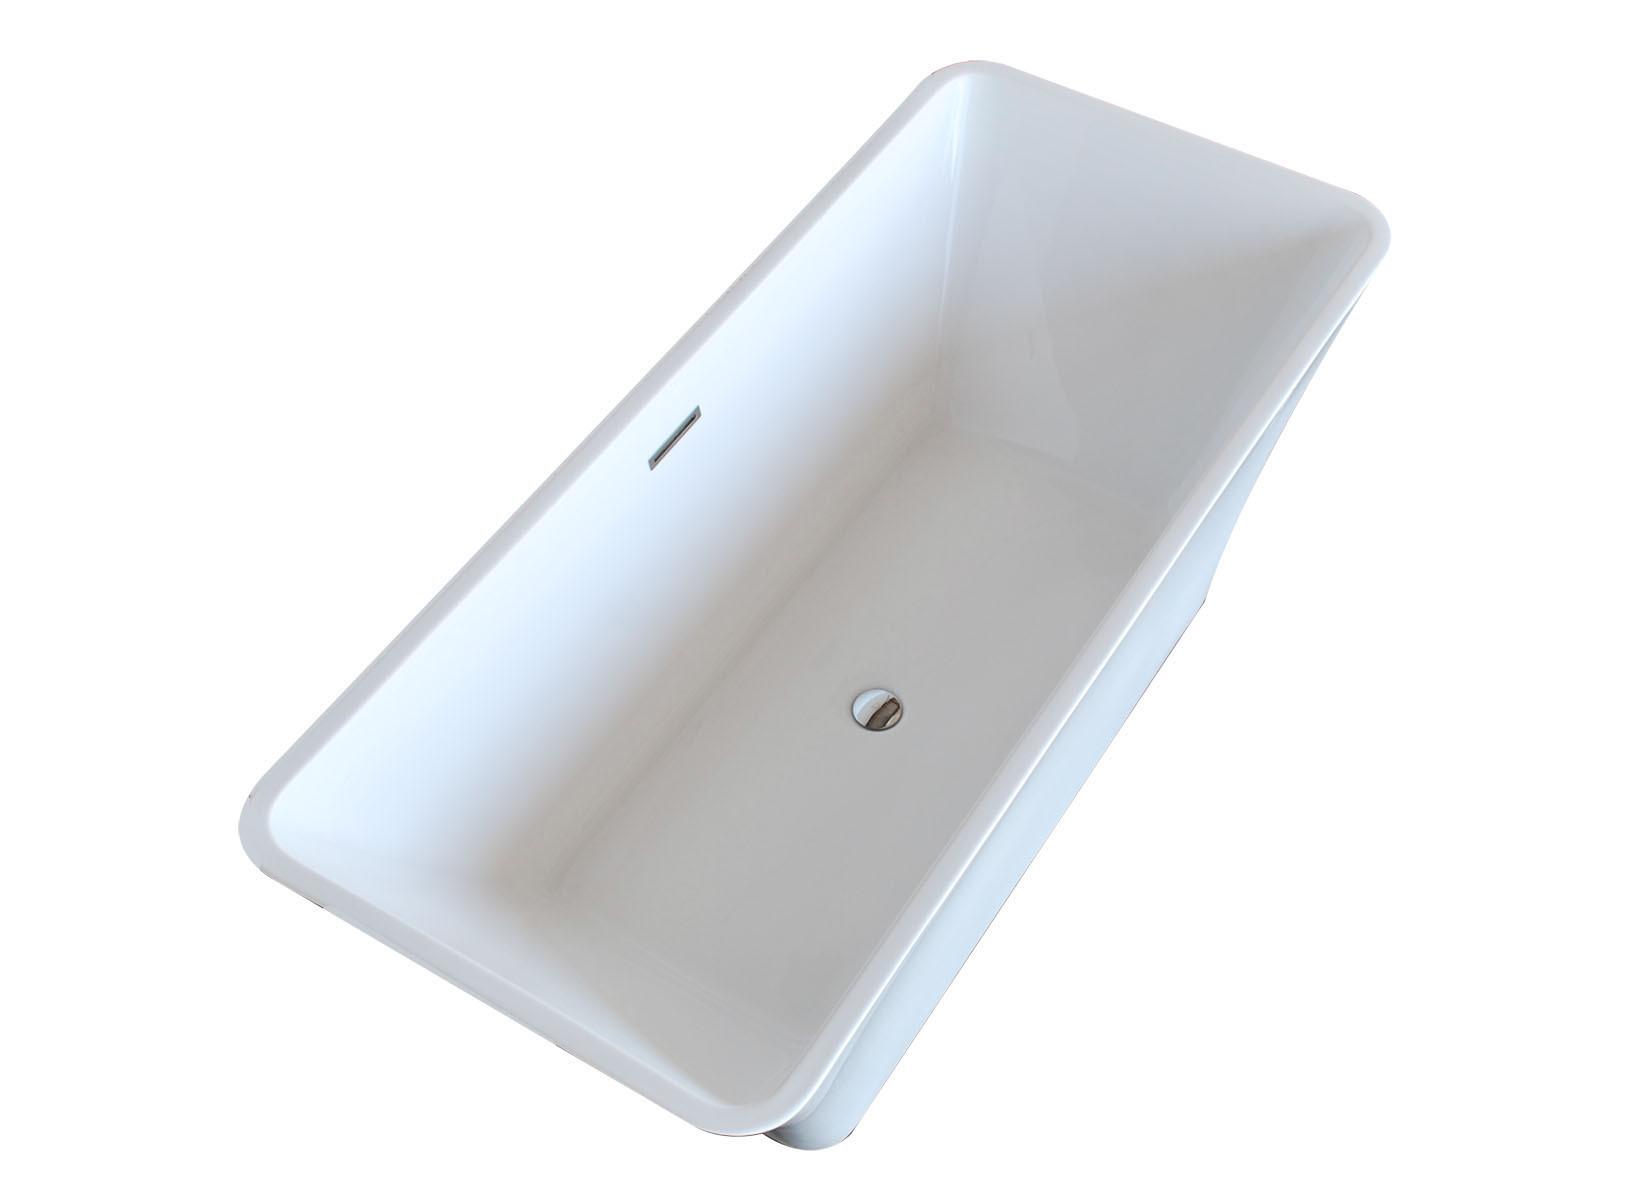 Anzzi FT-AZ006 Arden 5.5 ft. Center Drain Freestanding Bathtub Glossy White